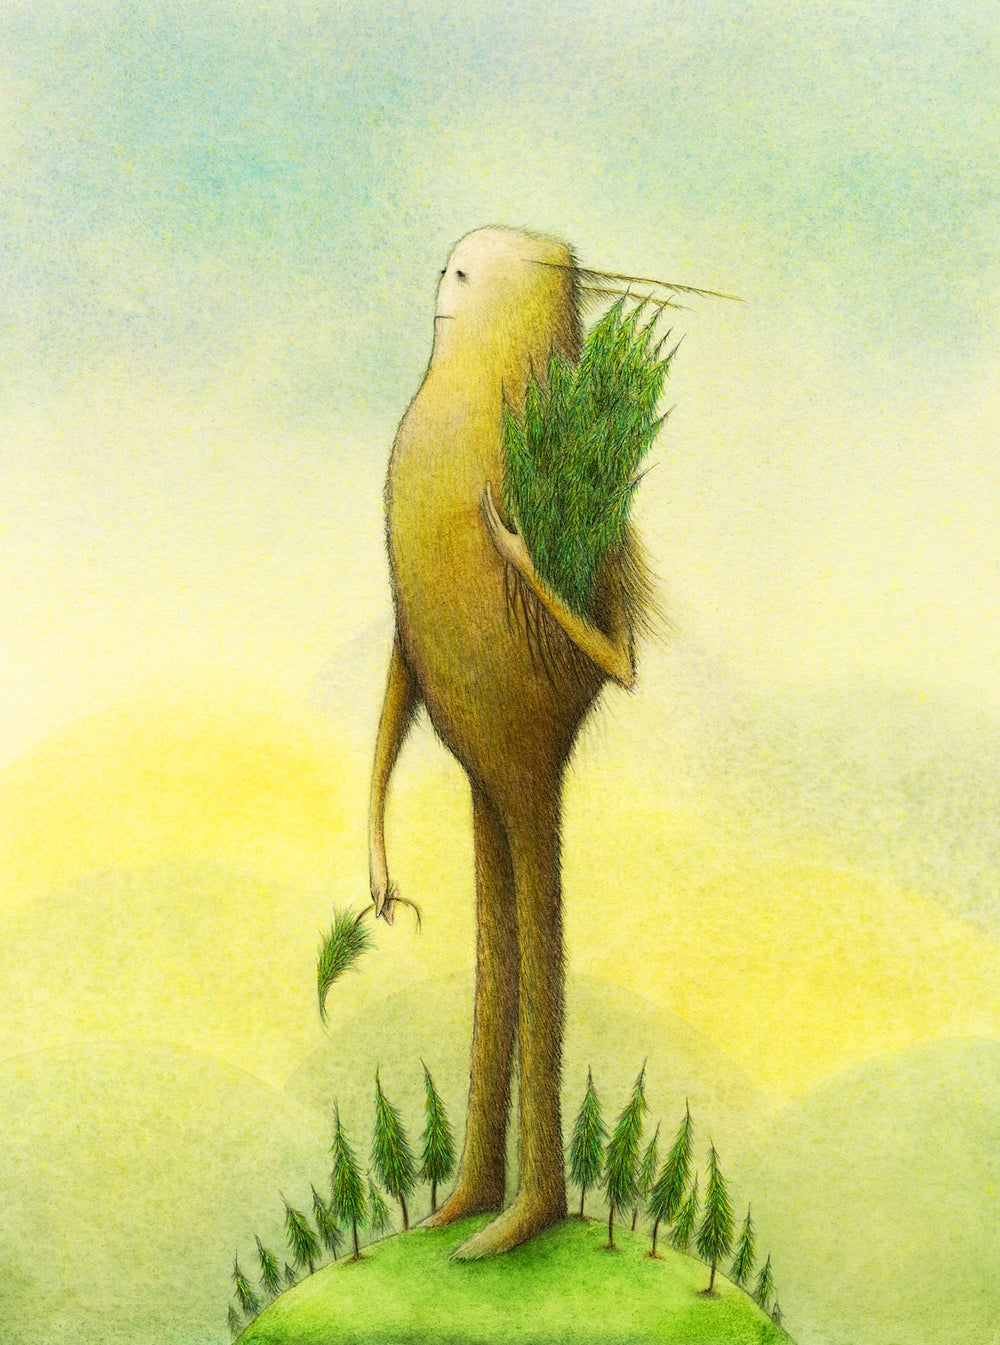 Image of The Arborist